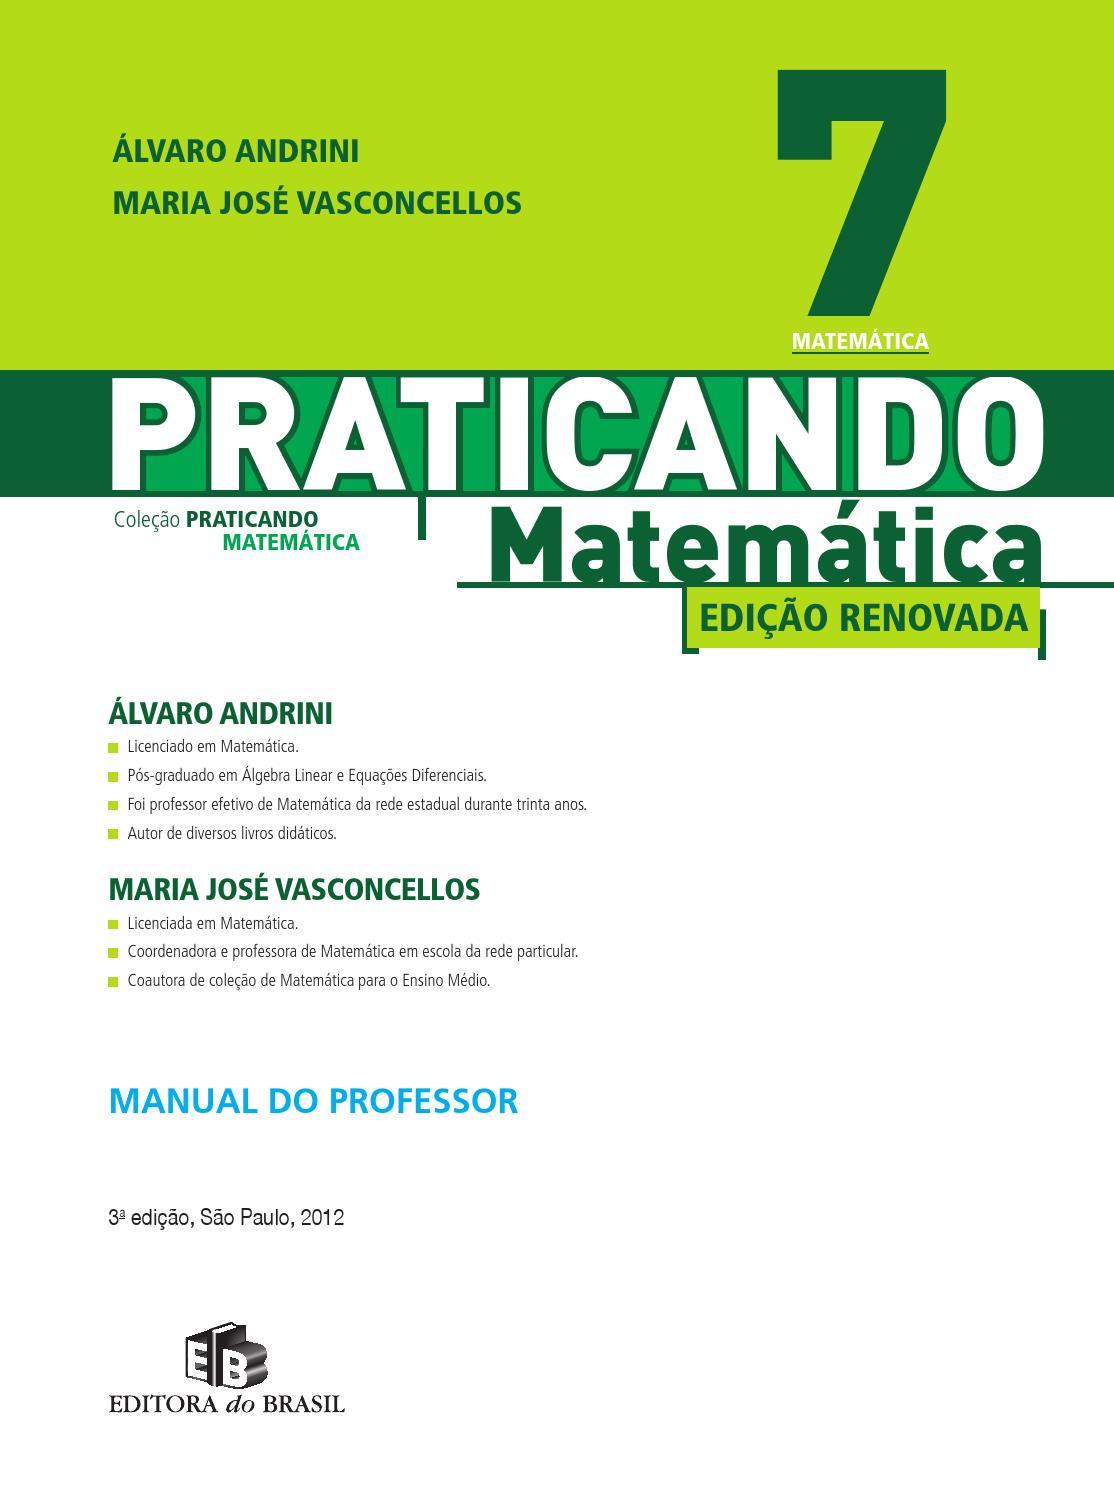 Praticando matematica 7ano by ronaldo.cardoso - issuu 2f599ce3e8